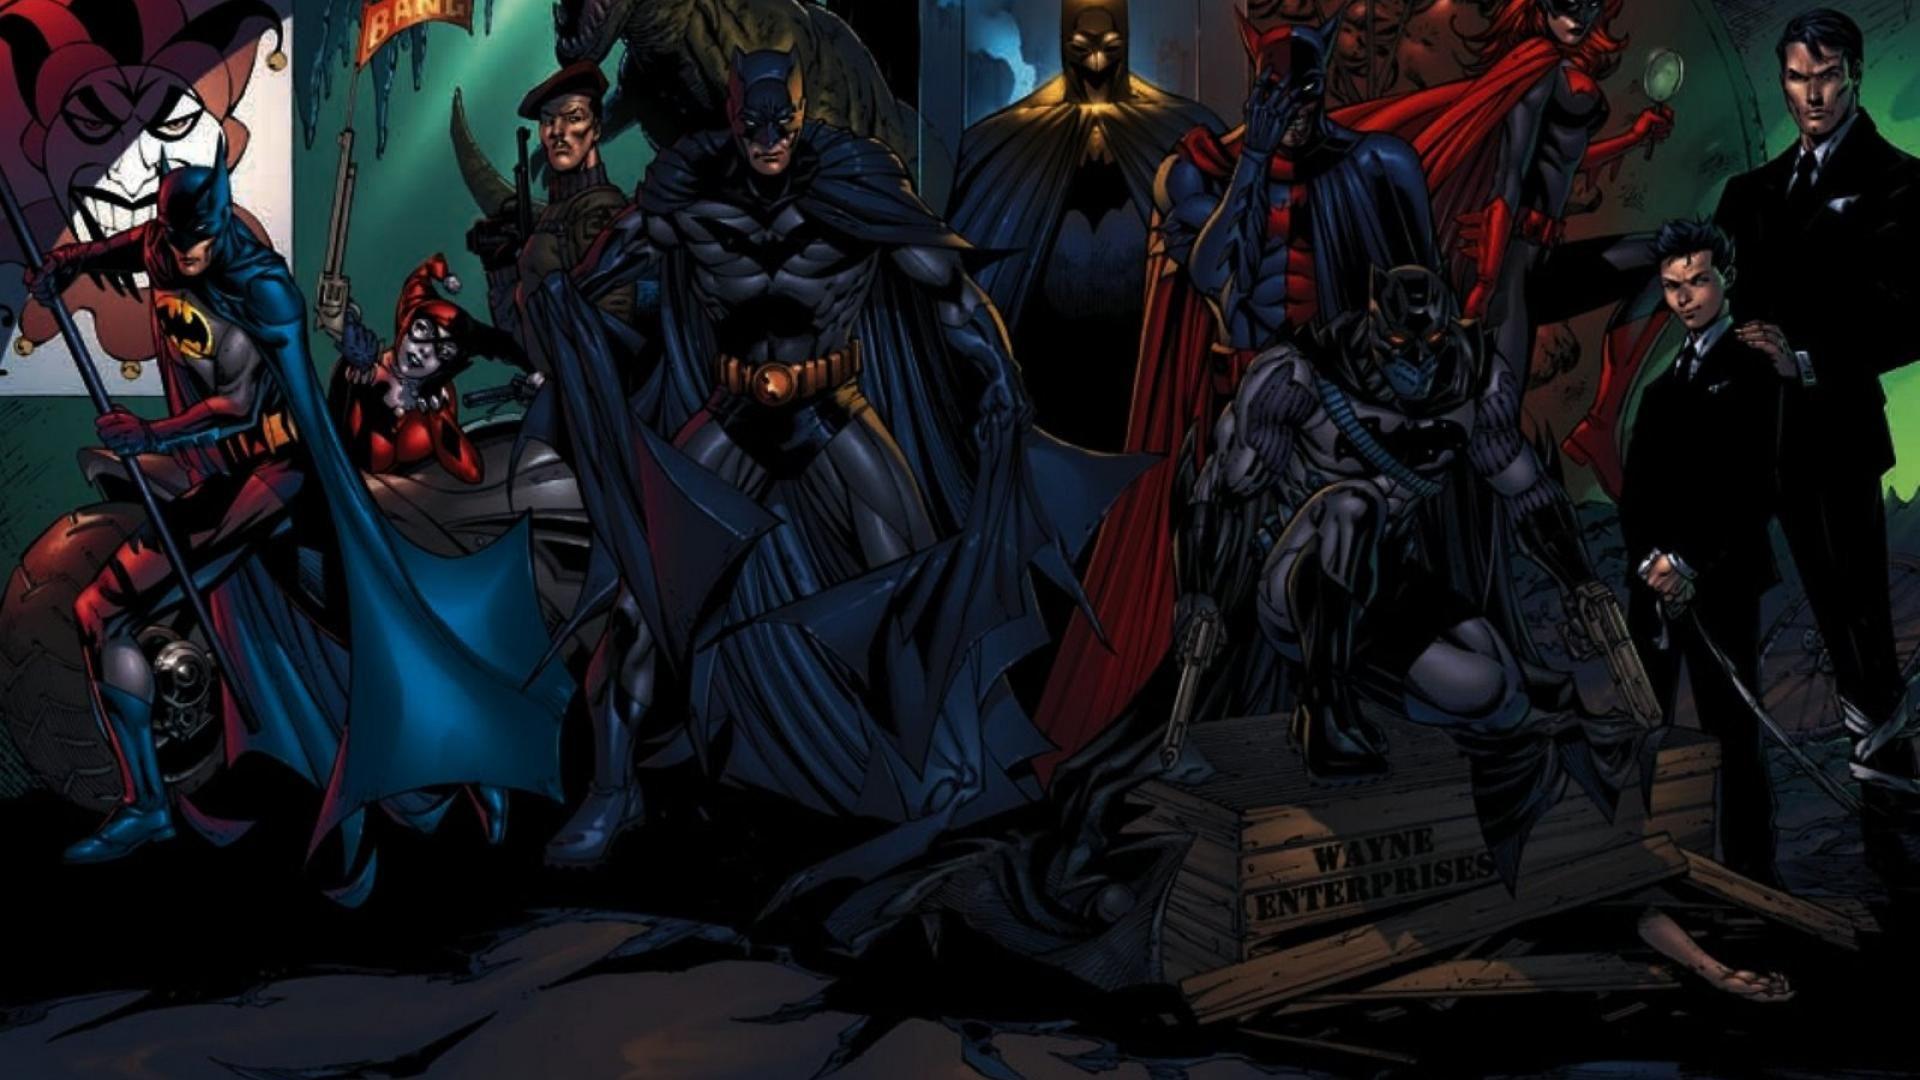 Batman Batwoman Dc Comics Harley Quinn The Joker Wallpaper